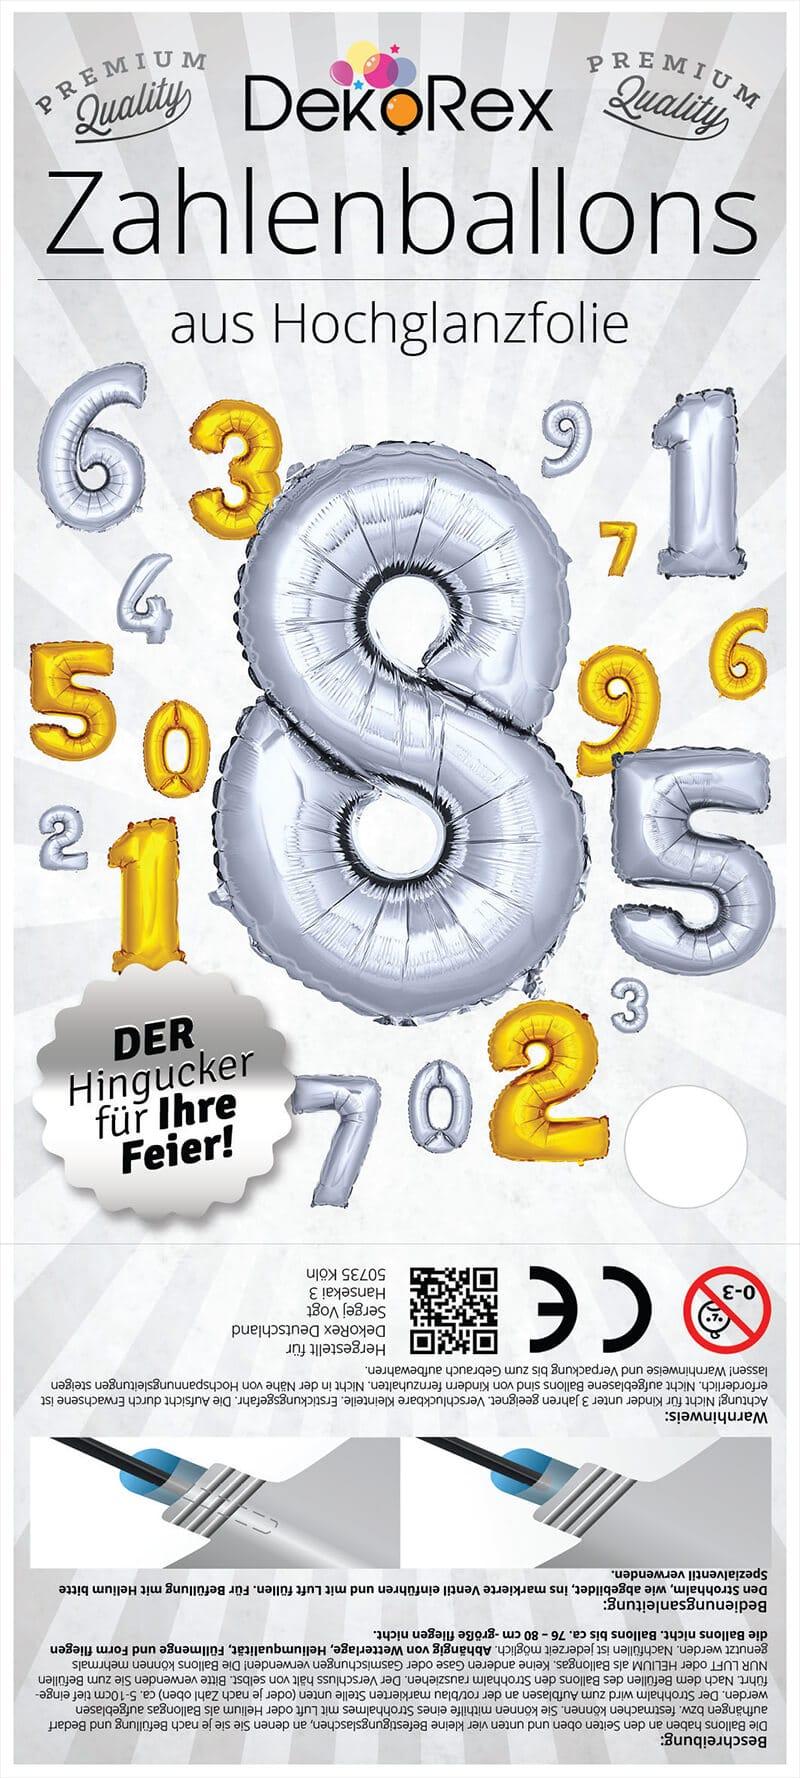 DekoRex Zahlenballons